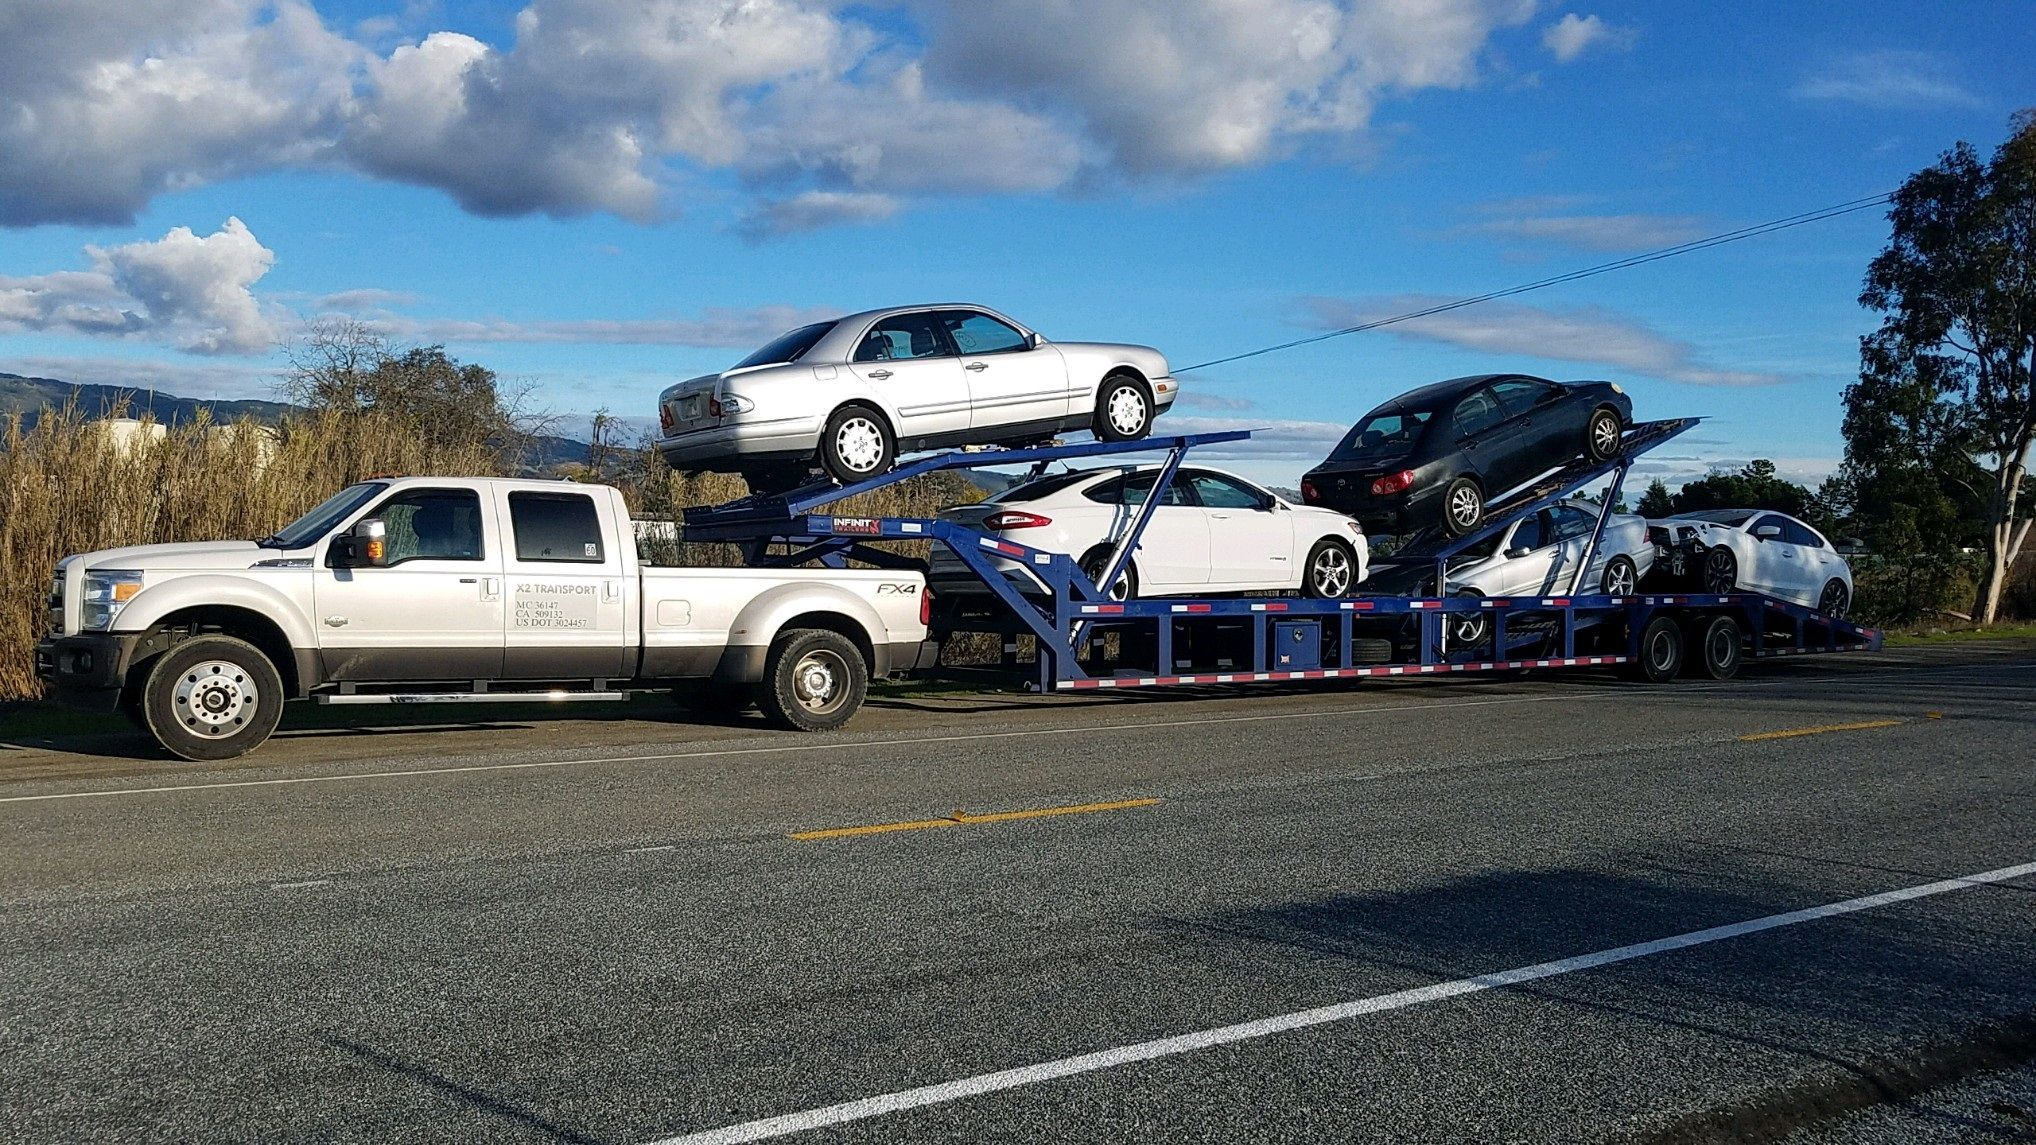 5 Car Hauler Trailer For Sale Car Hauler Trailer Trailers For Sale Trailer